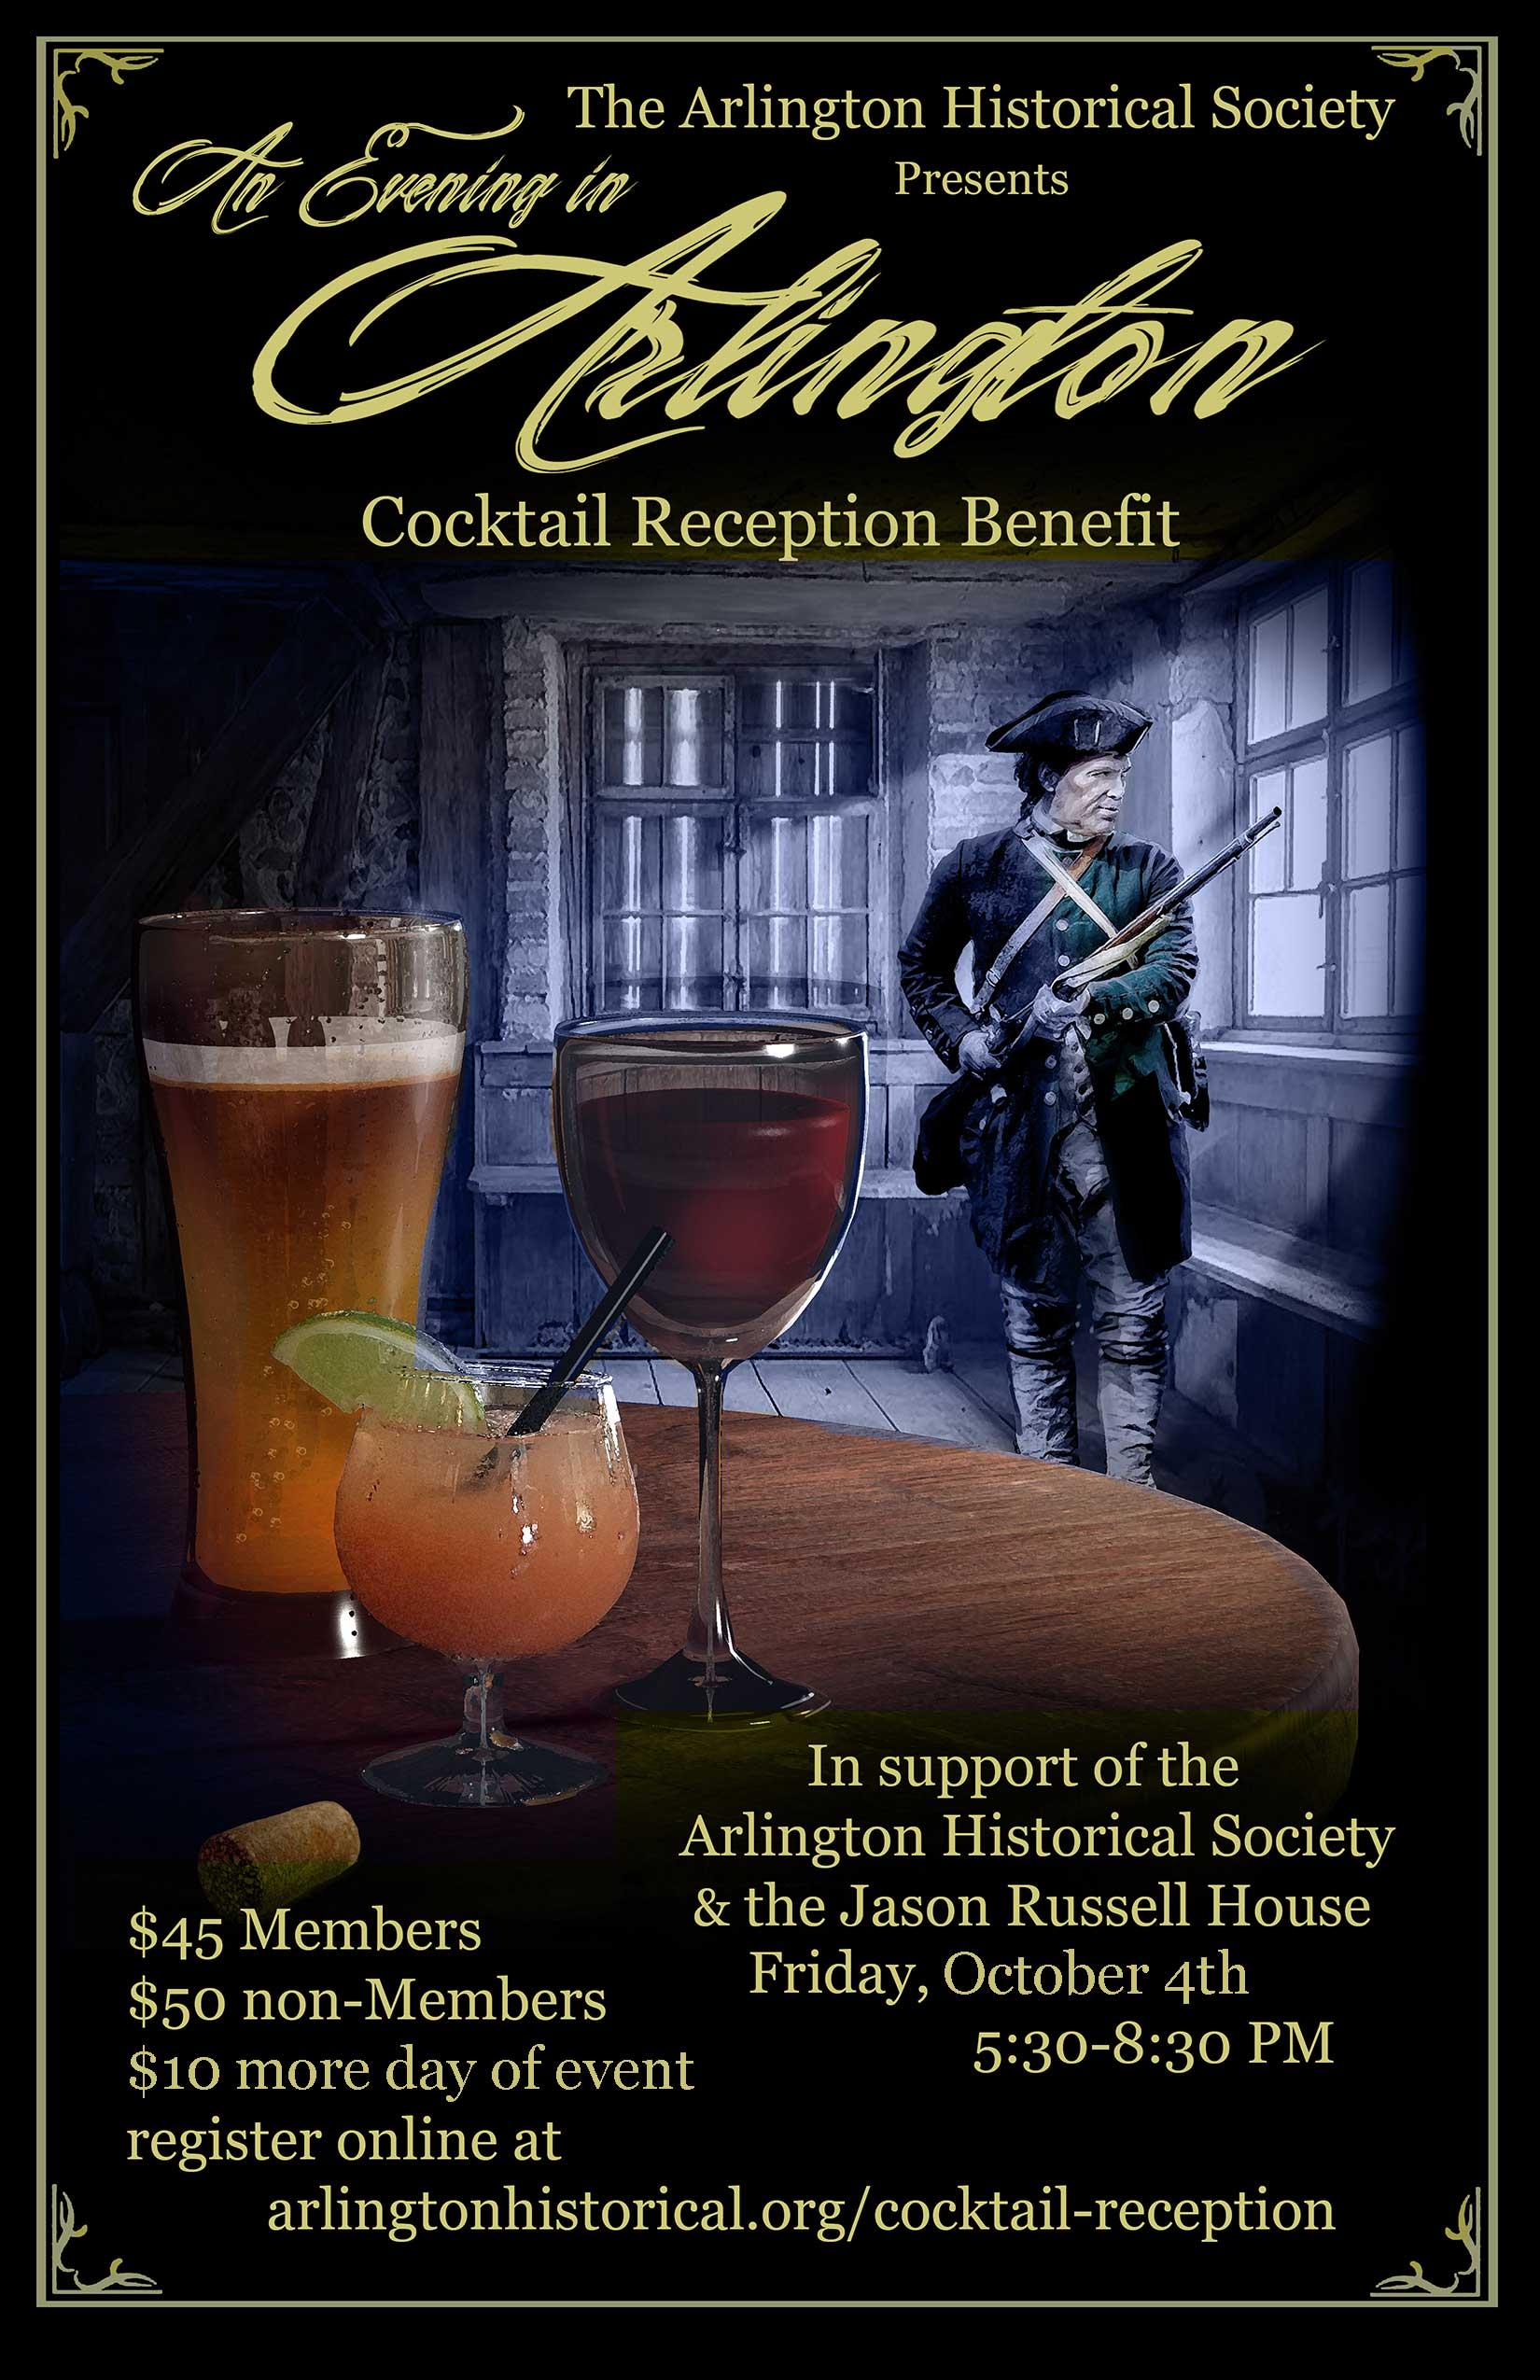 Arlington Historical Society Cocktail Reception, Friday October 4, 2019